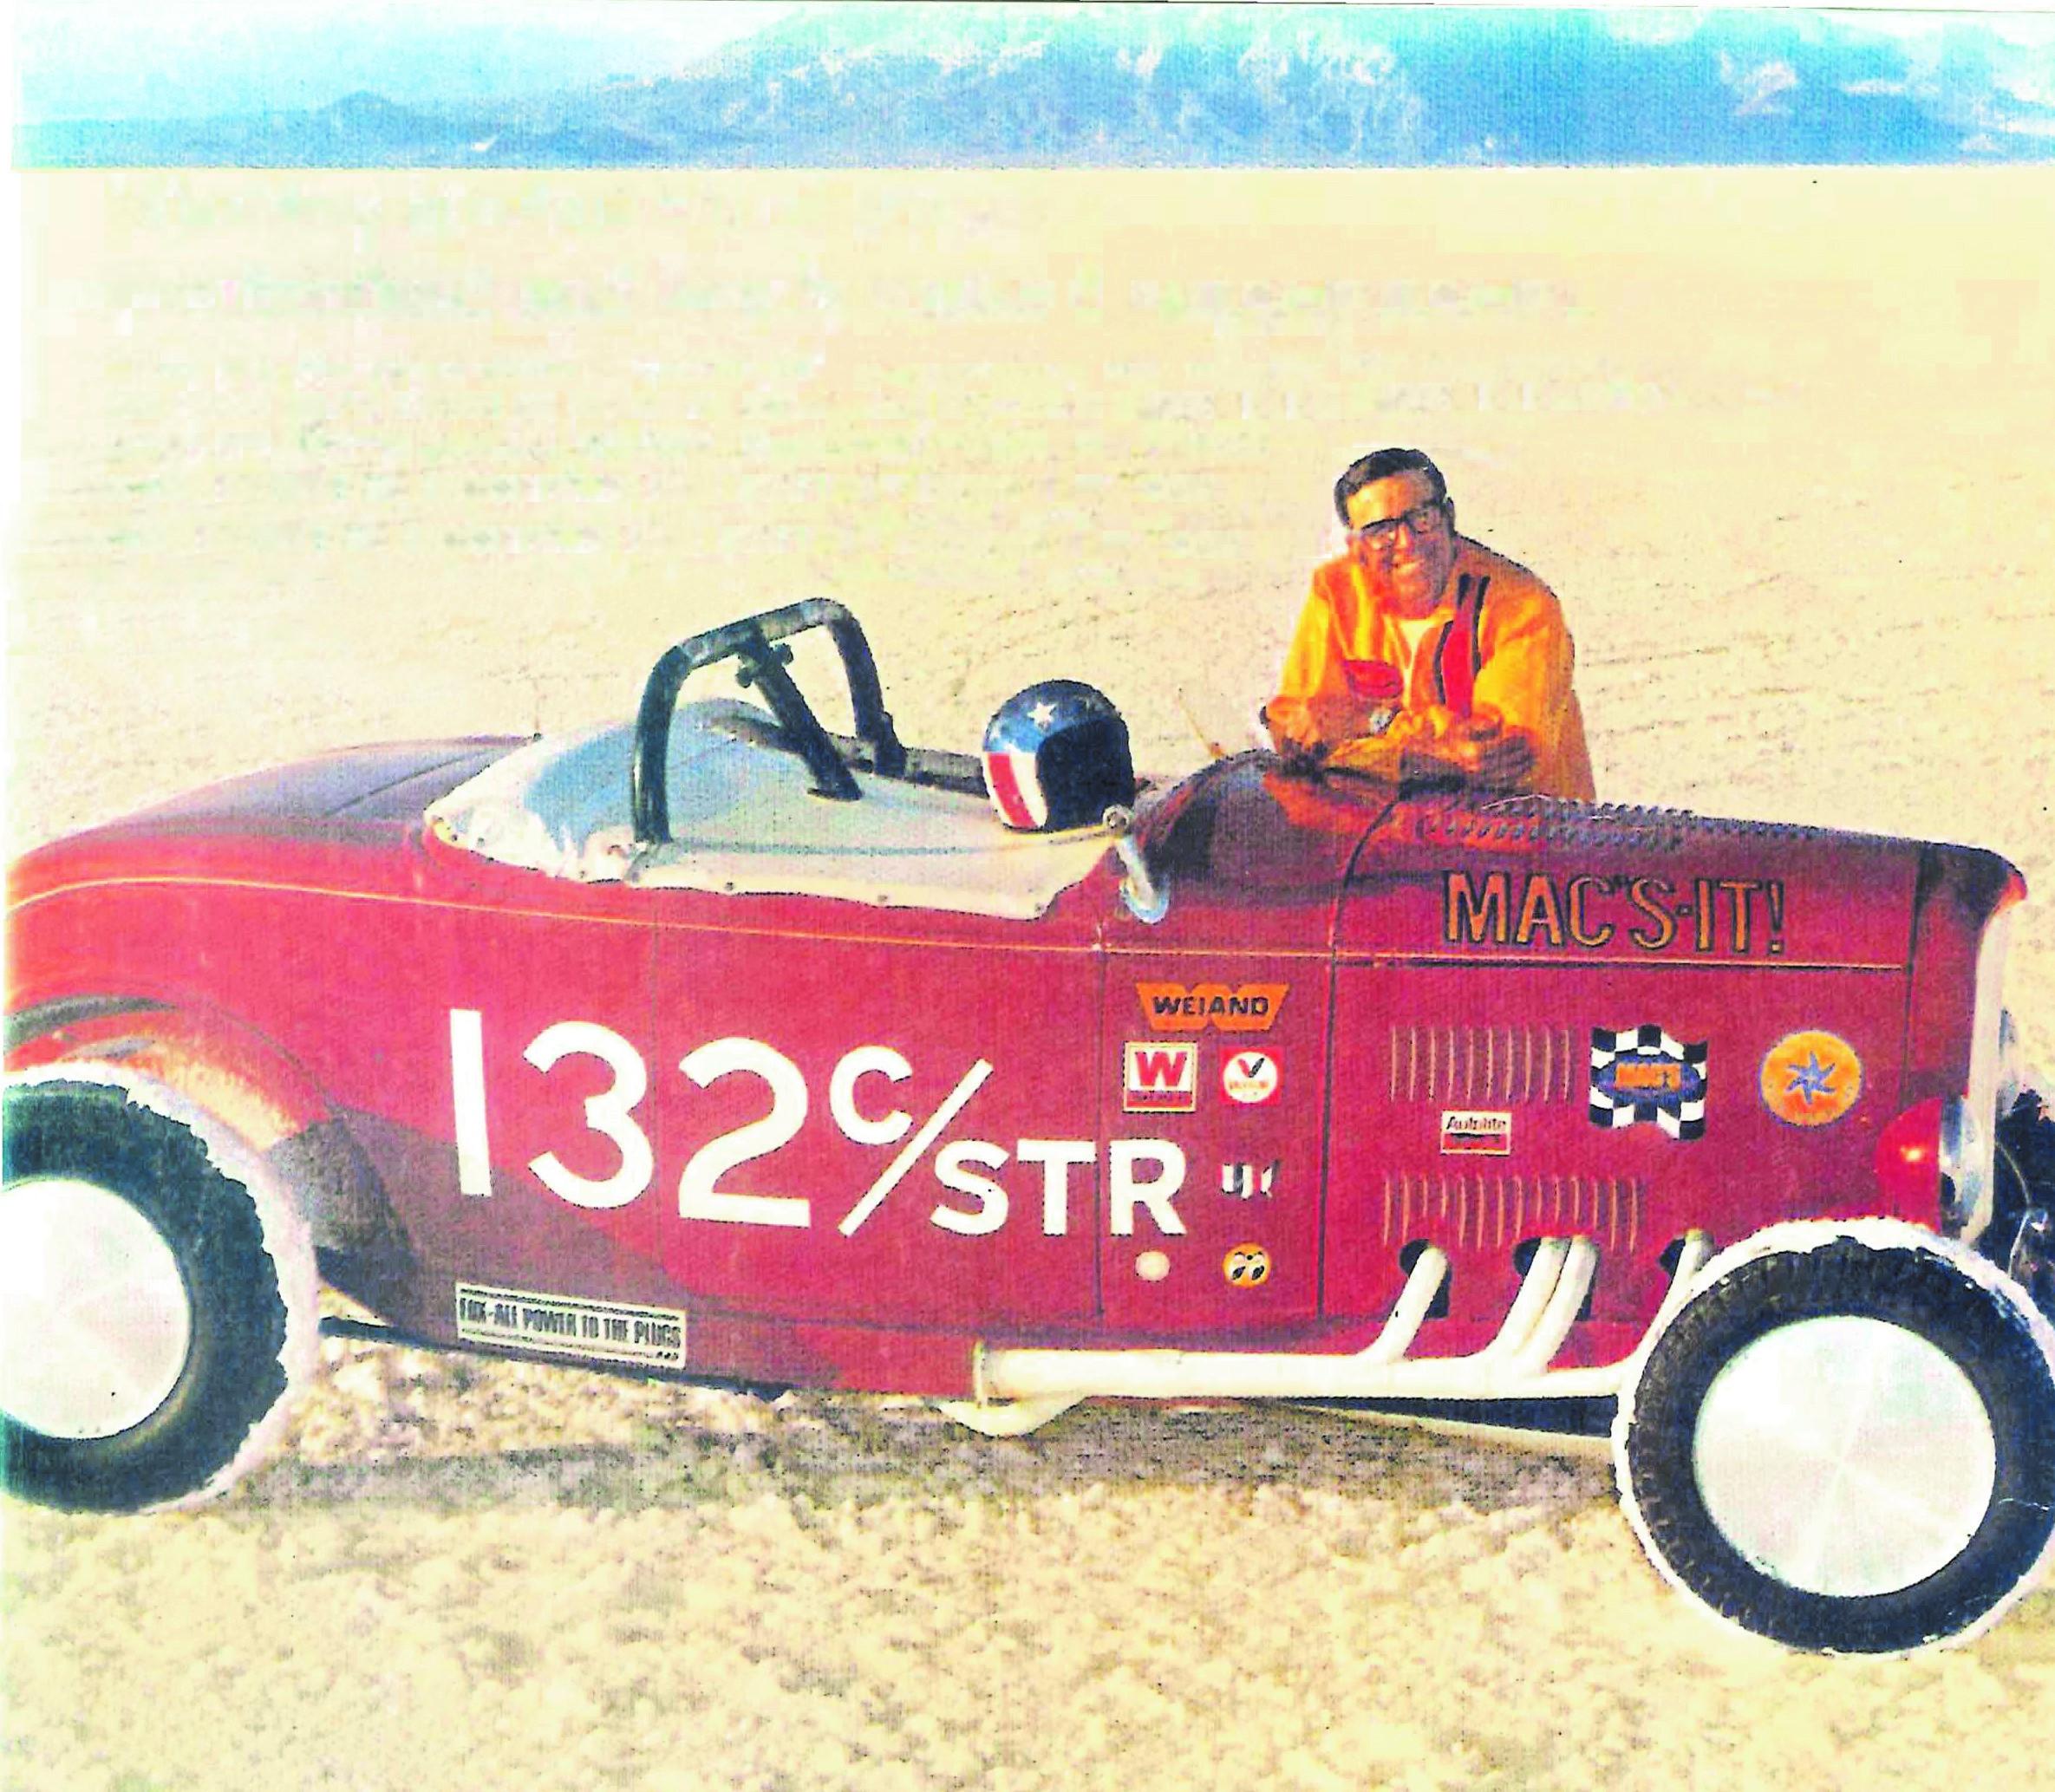 McGee Roadster - 1932 Ford - HVA - Dick Scritchfield at the Bonneville Salt Flats